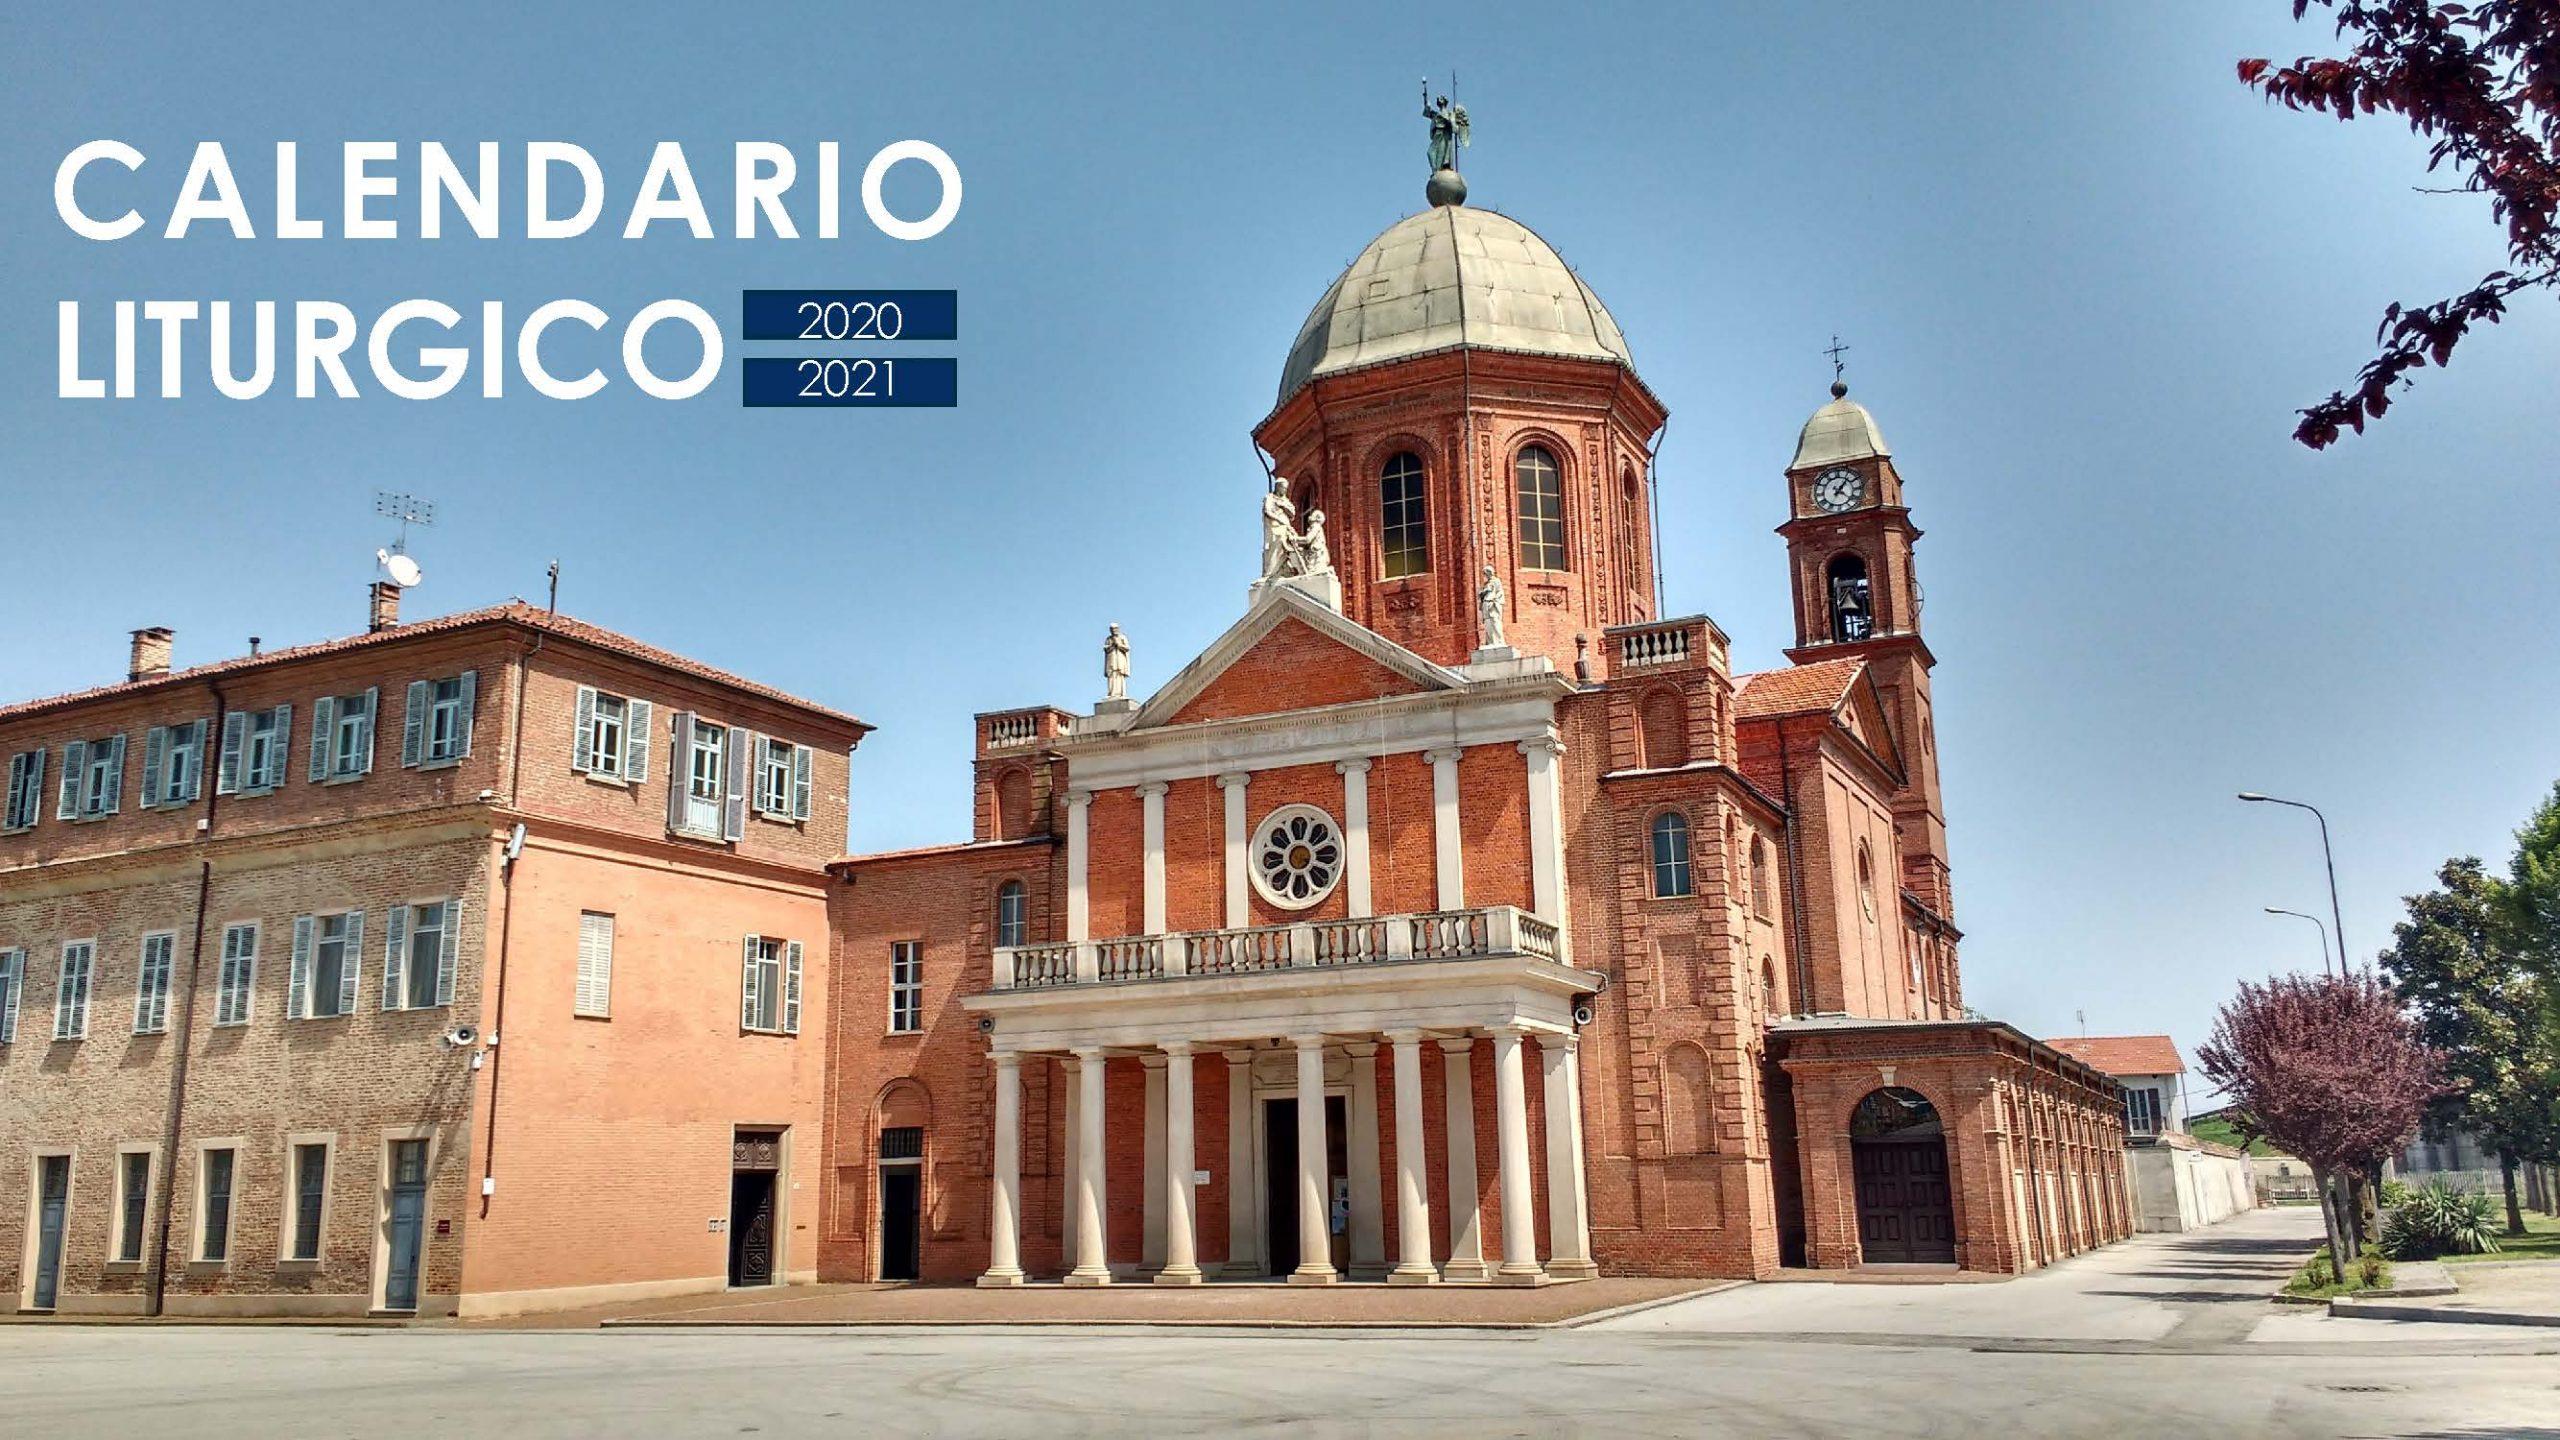 Ufficio Liturgico » Calendario Liturgico Regionale 2020 2021